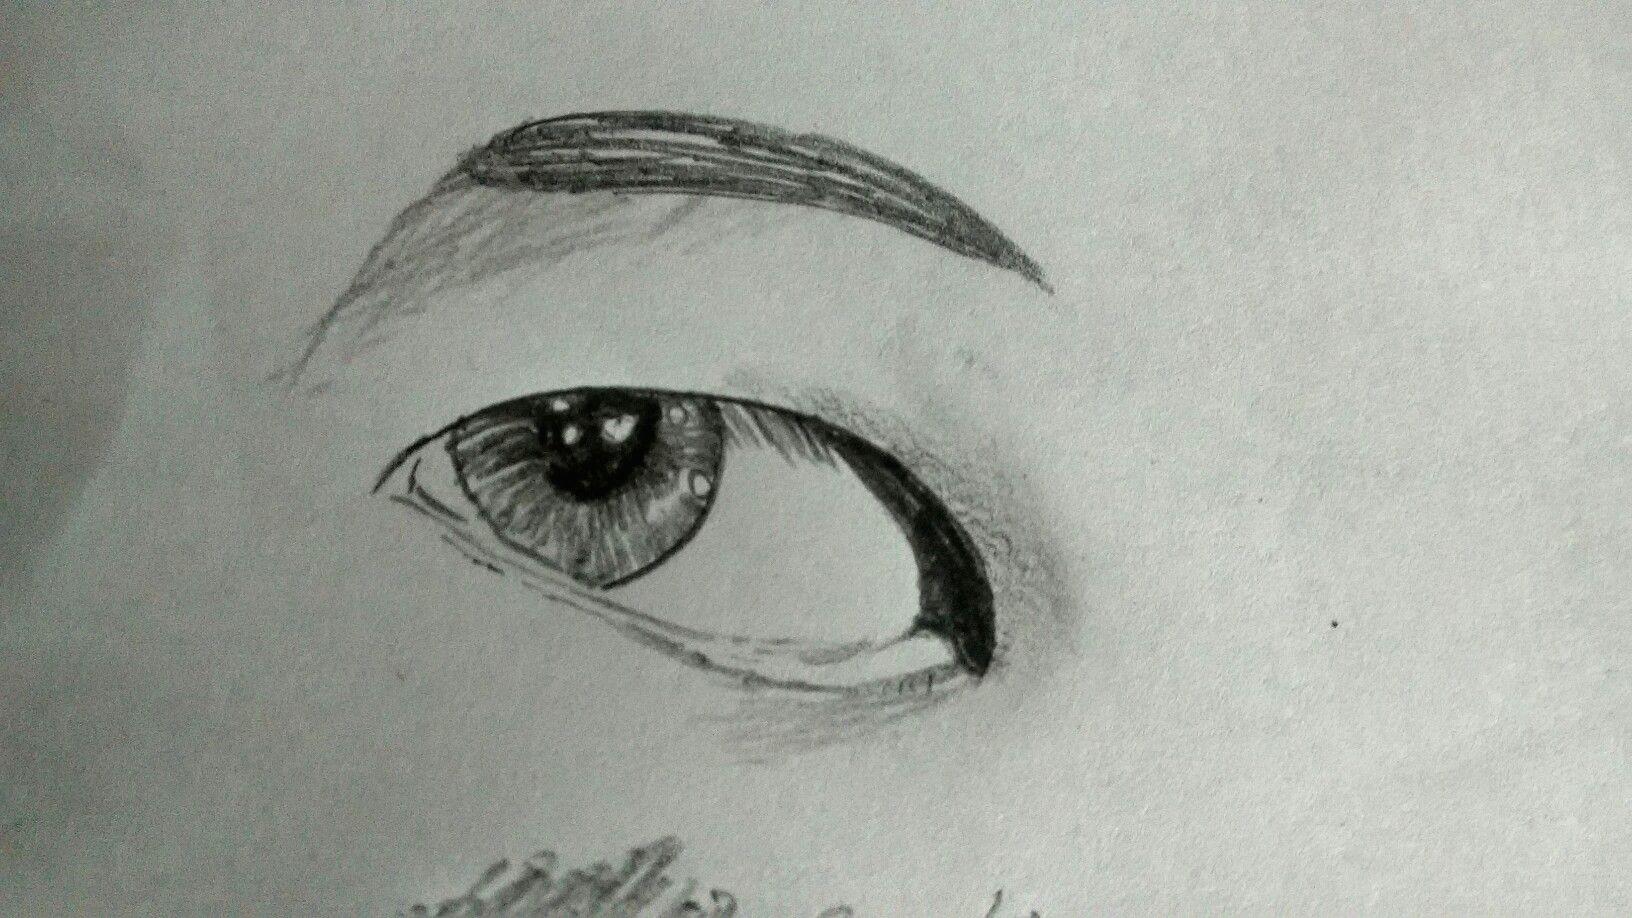 Bts Drawings Easy Easy Sketch Of An Eye Taehyung S Eye Bts Fanart In 2020